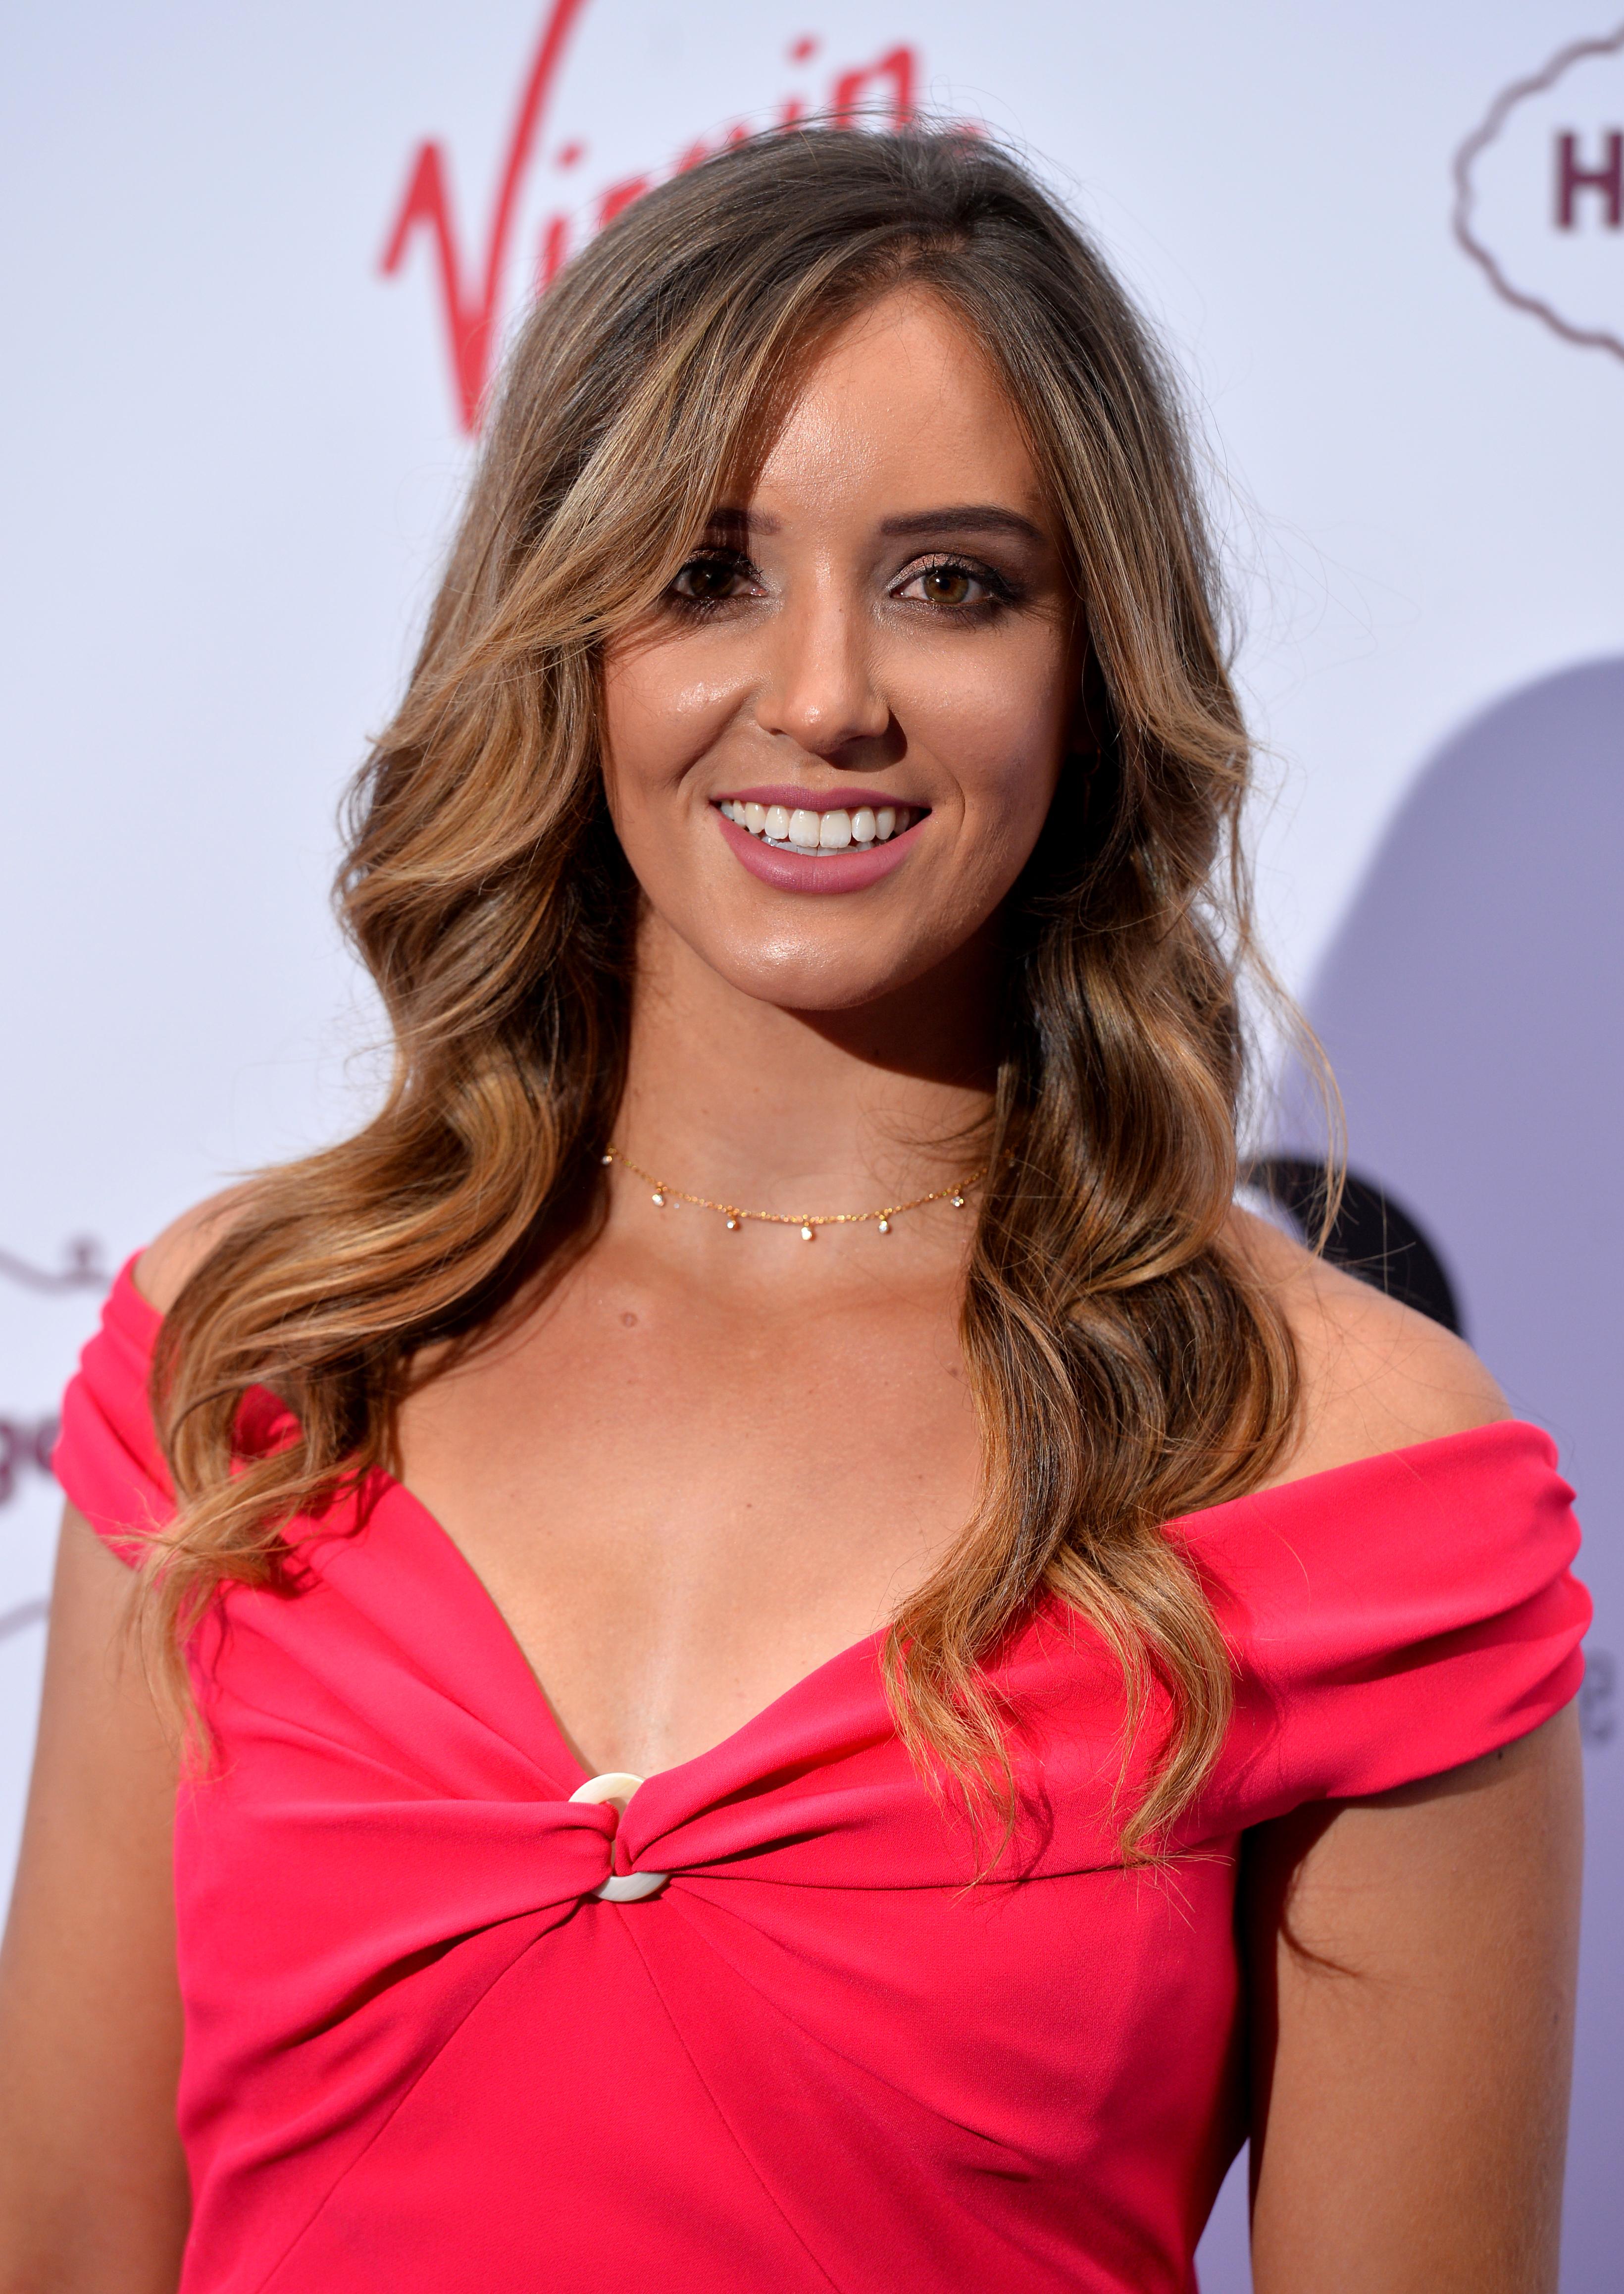 image Laura singer wimbledon tennis porn star